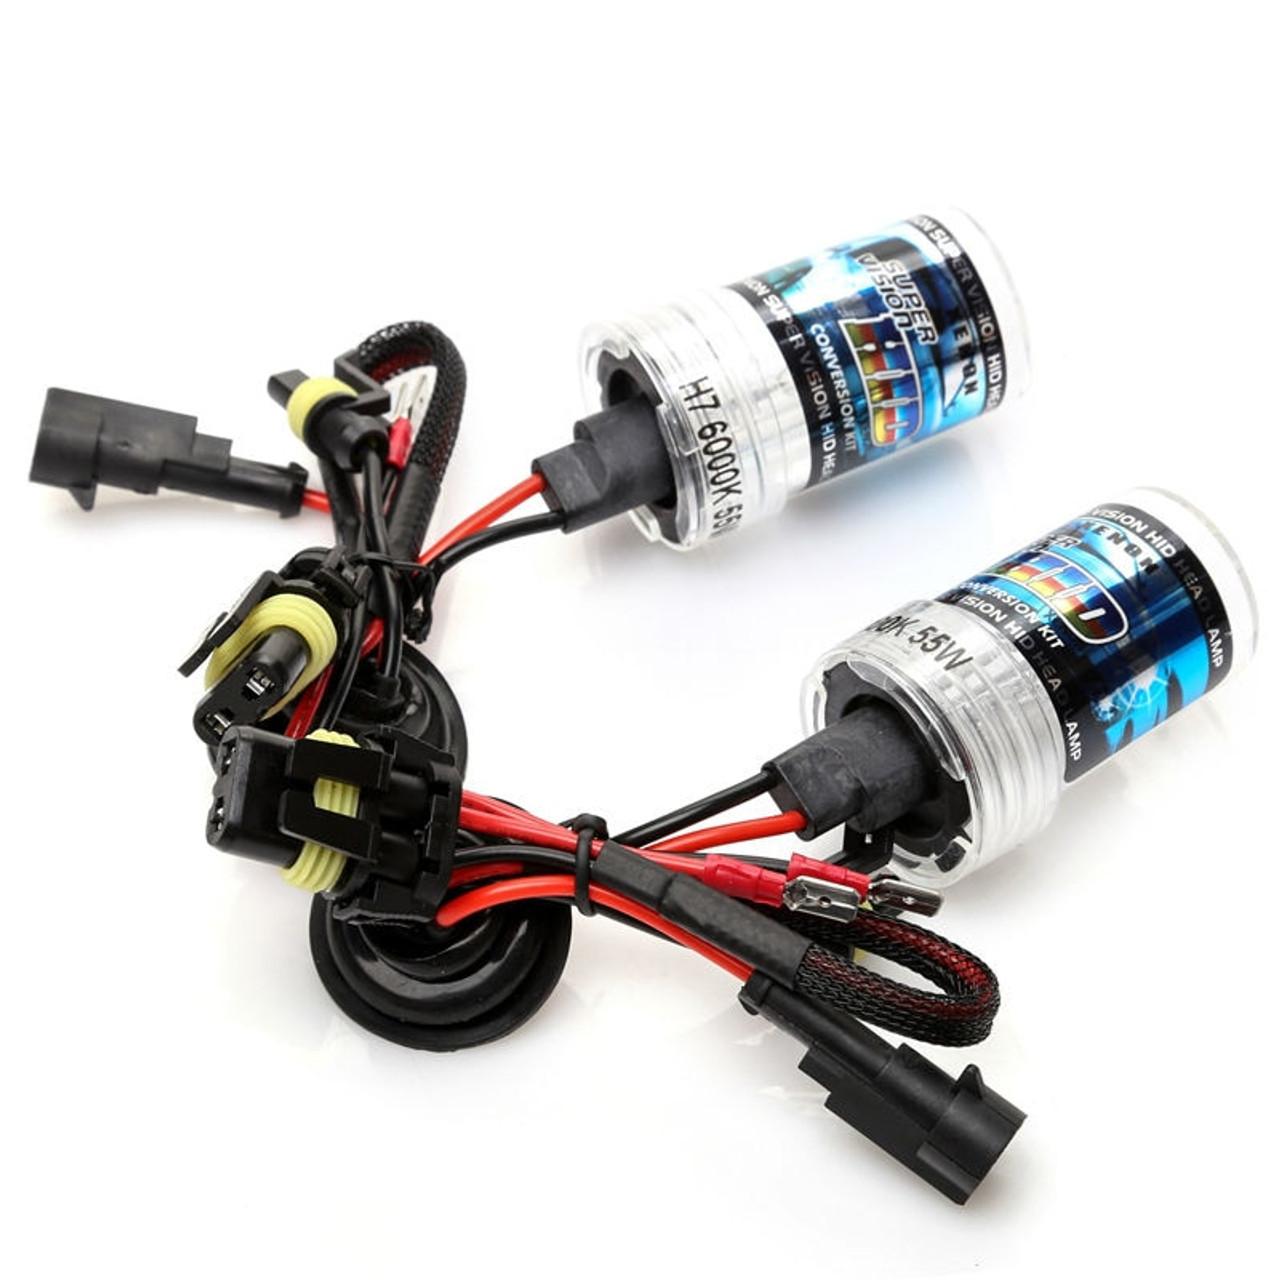 Xenon H7 Canbus HID Kit D2S H1 H4 H11 H3 HB4 9005 9006 Bulb For